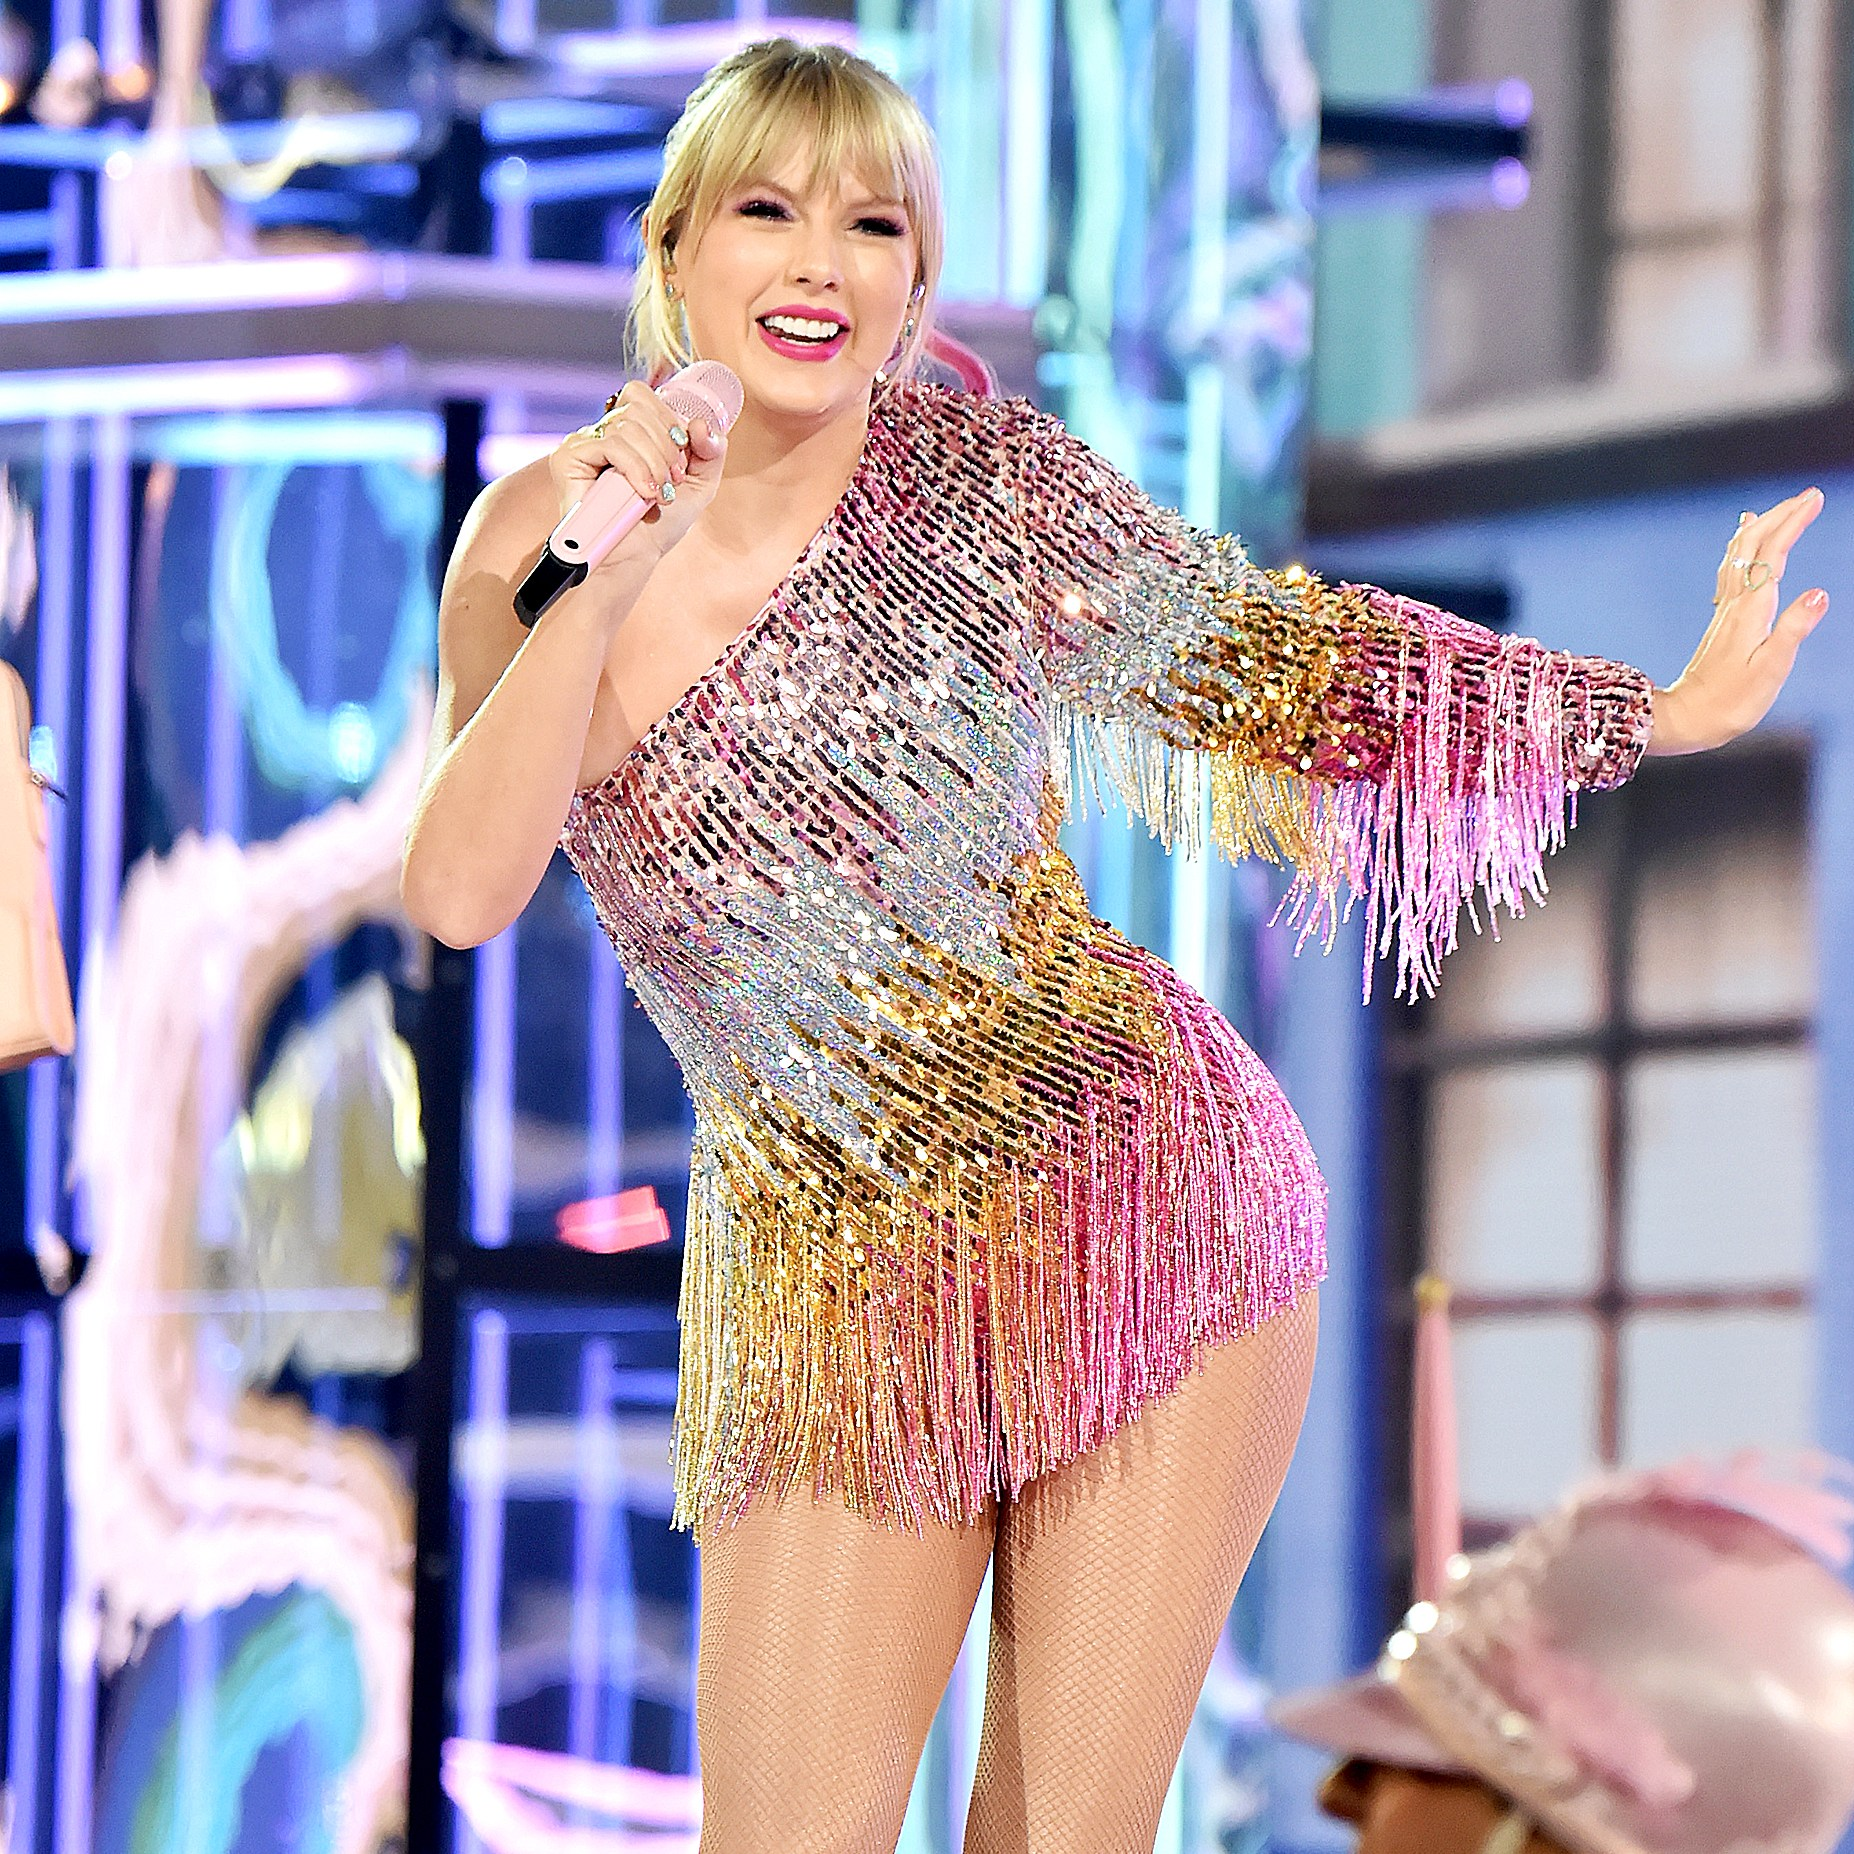 Taylor-Swift-Lover-Me-Album Title